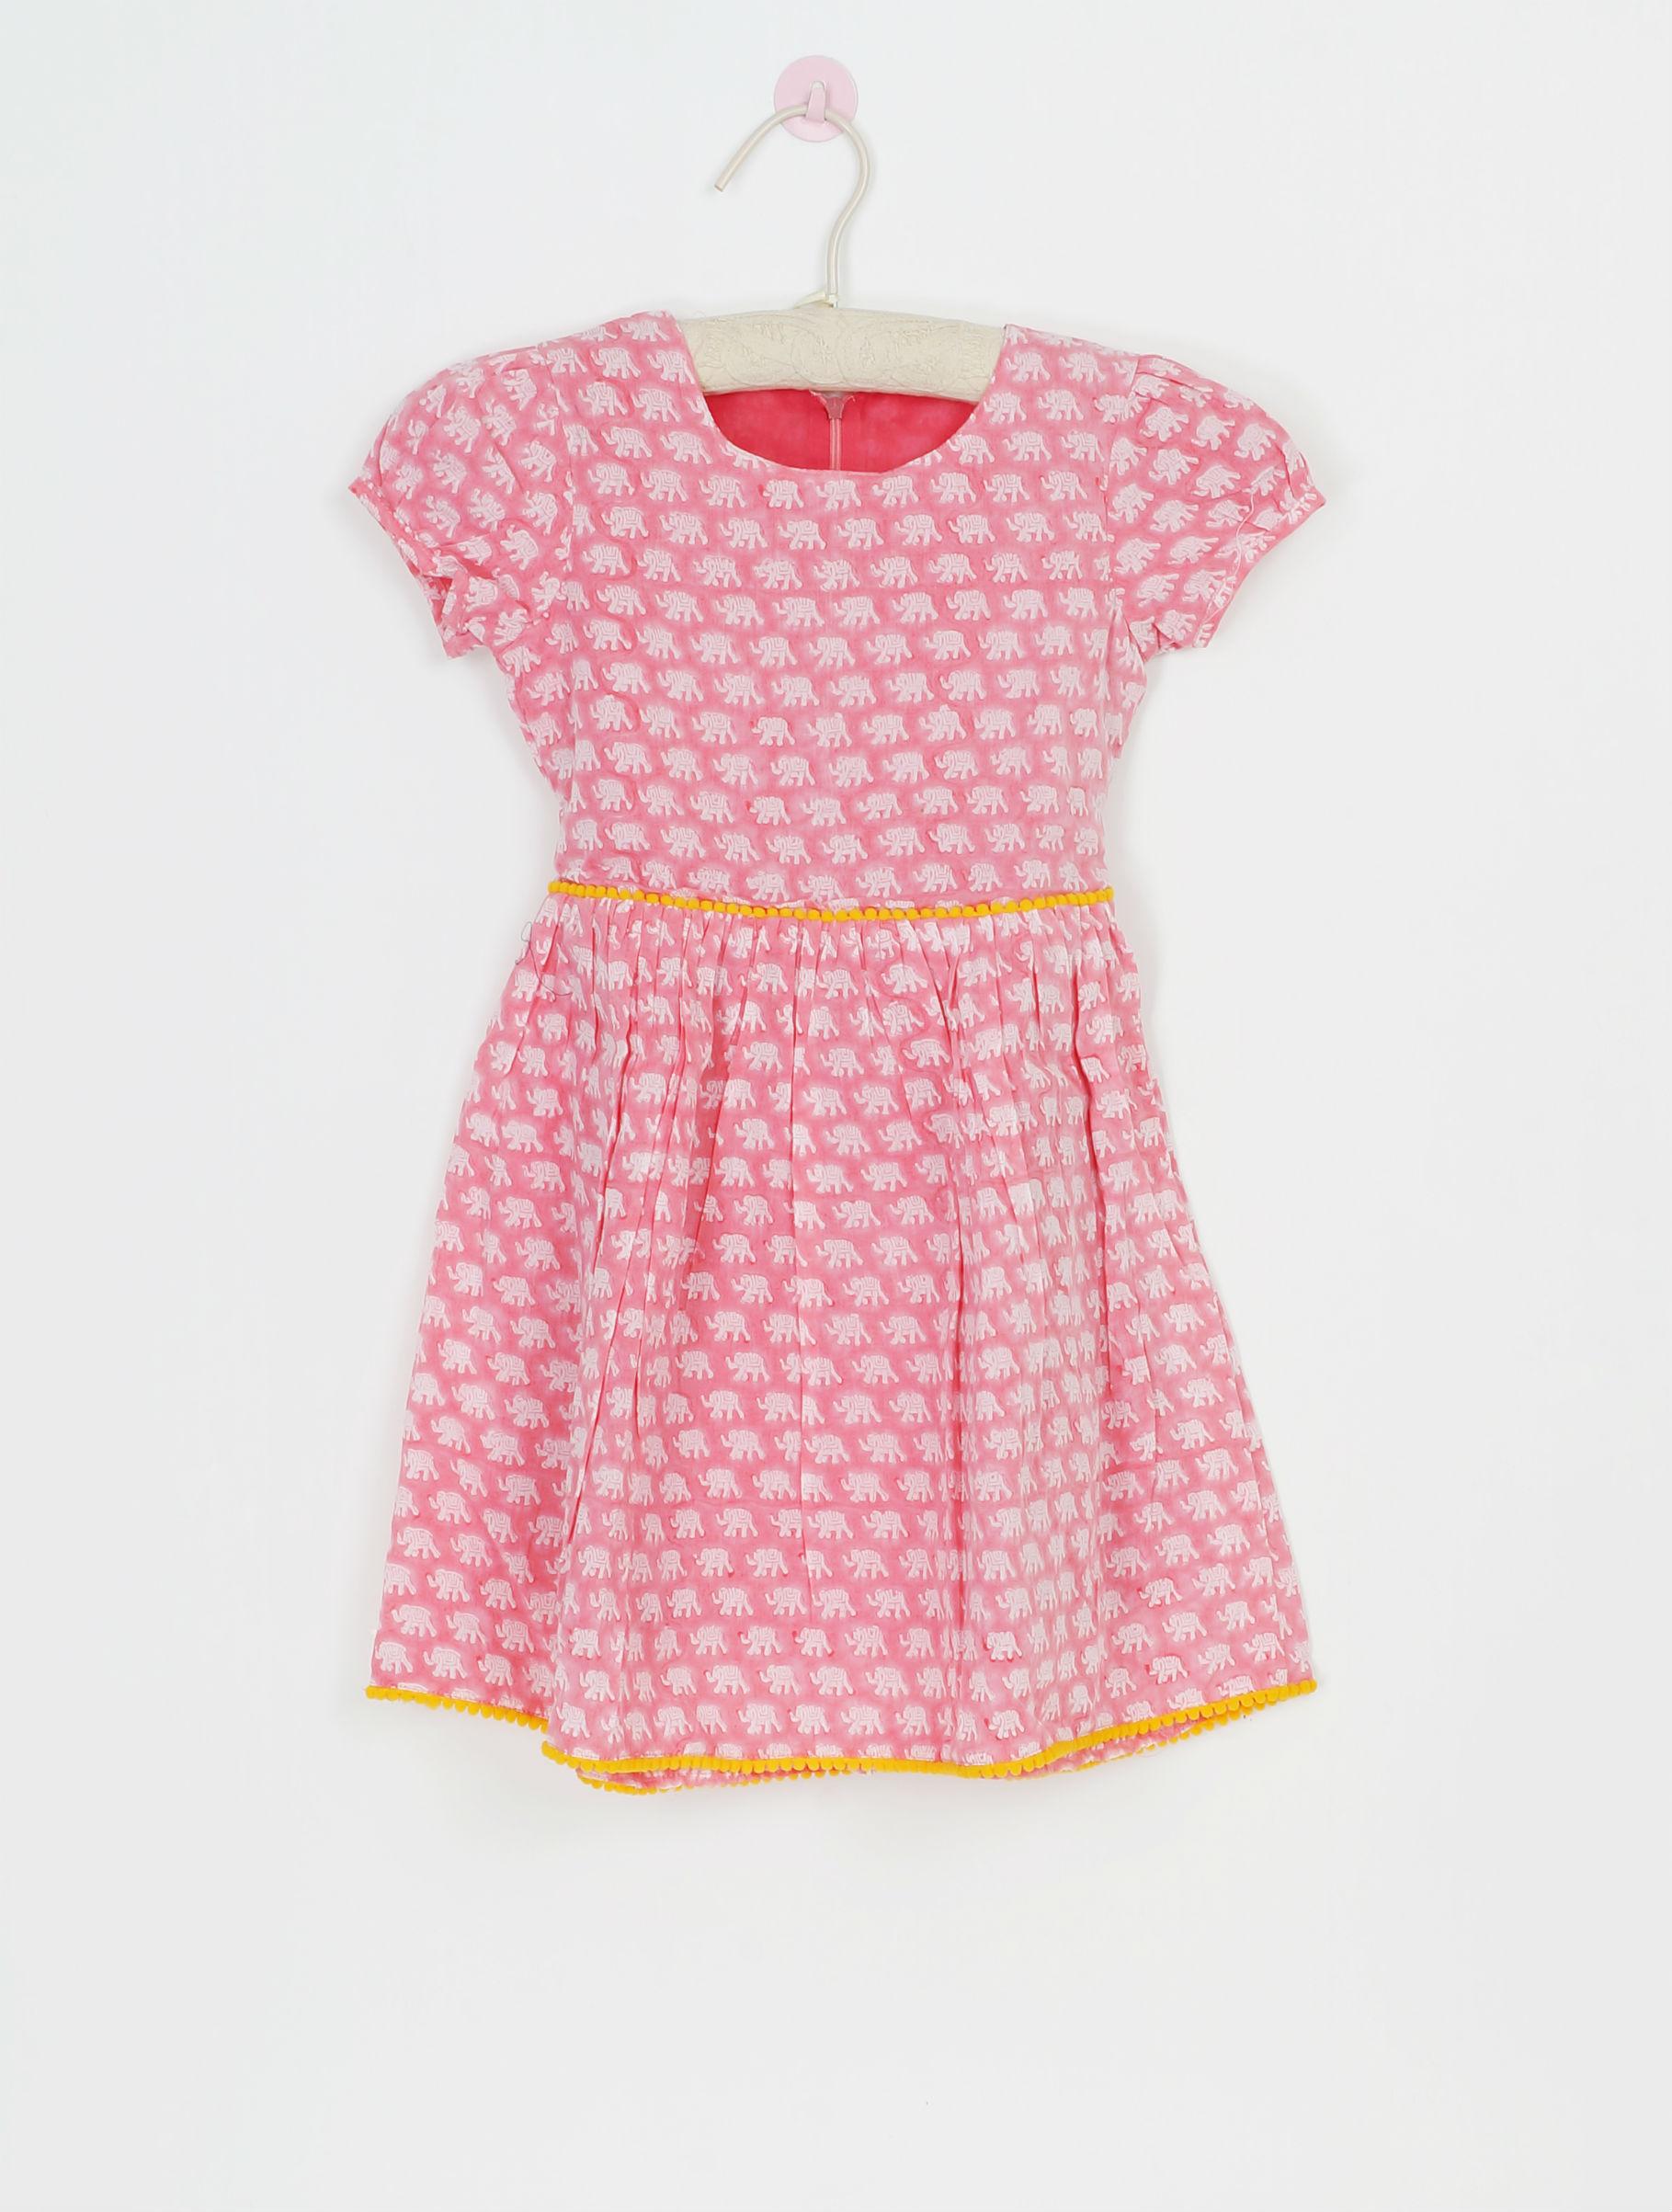 Pink elephant dress